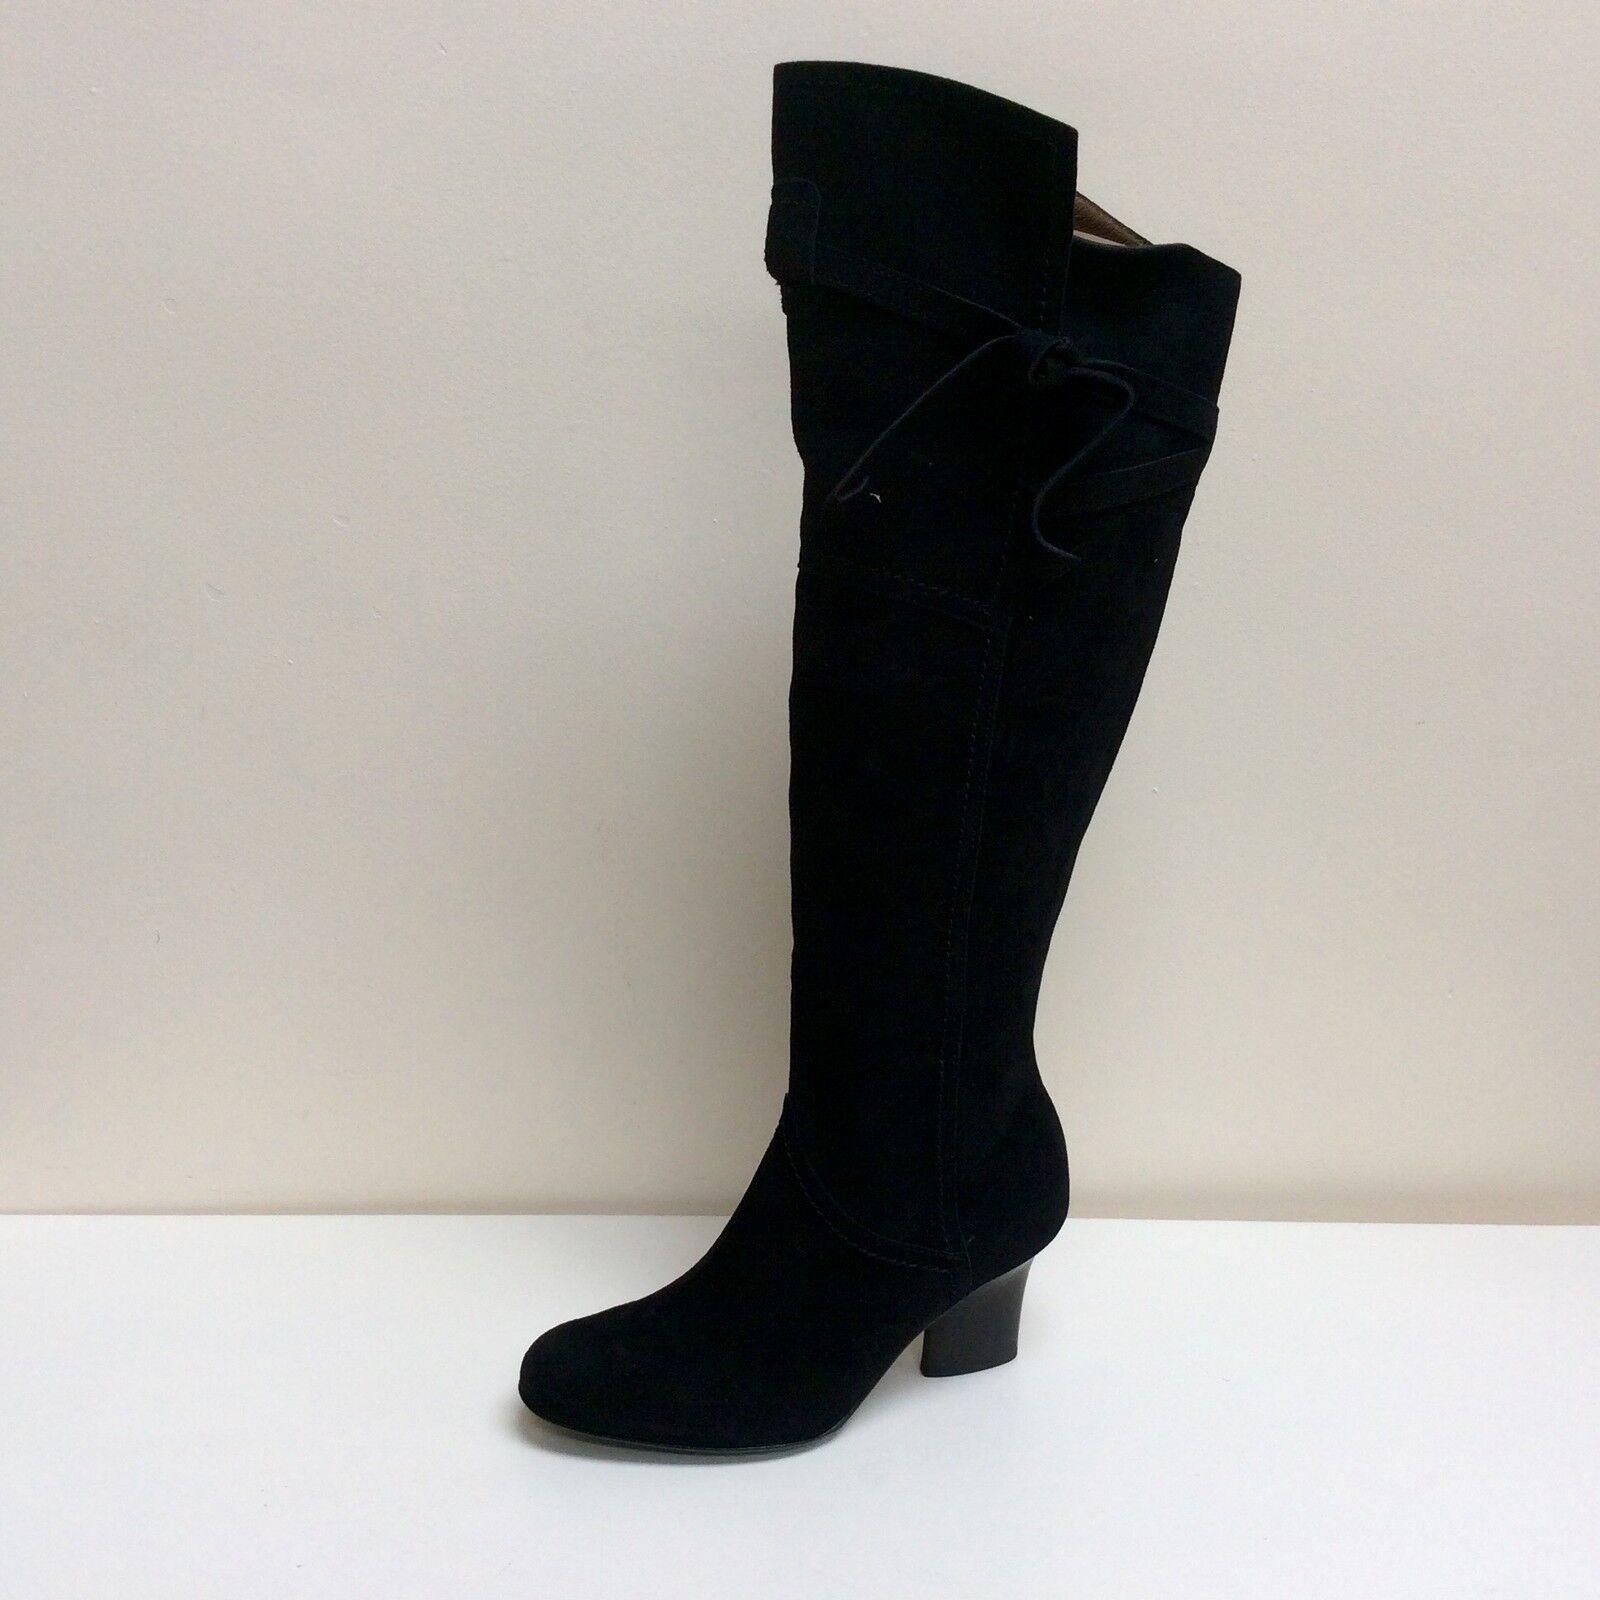 Peter Kaiser Jadin black suede knee high boots, UK 4.5/EU 37.5, RRP £229, BNWB